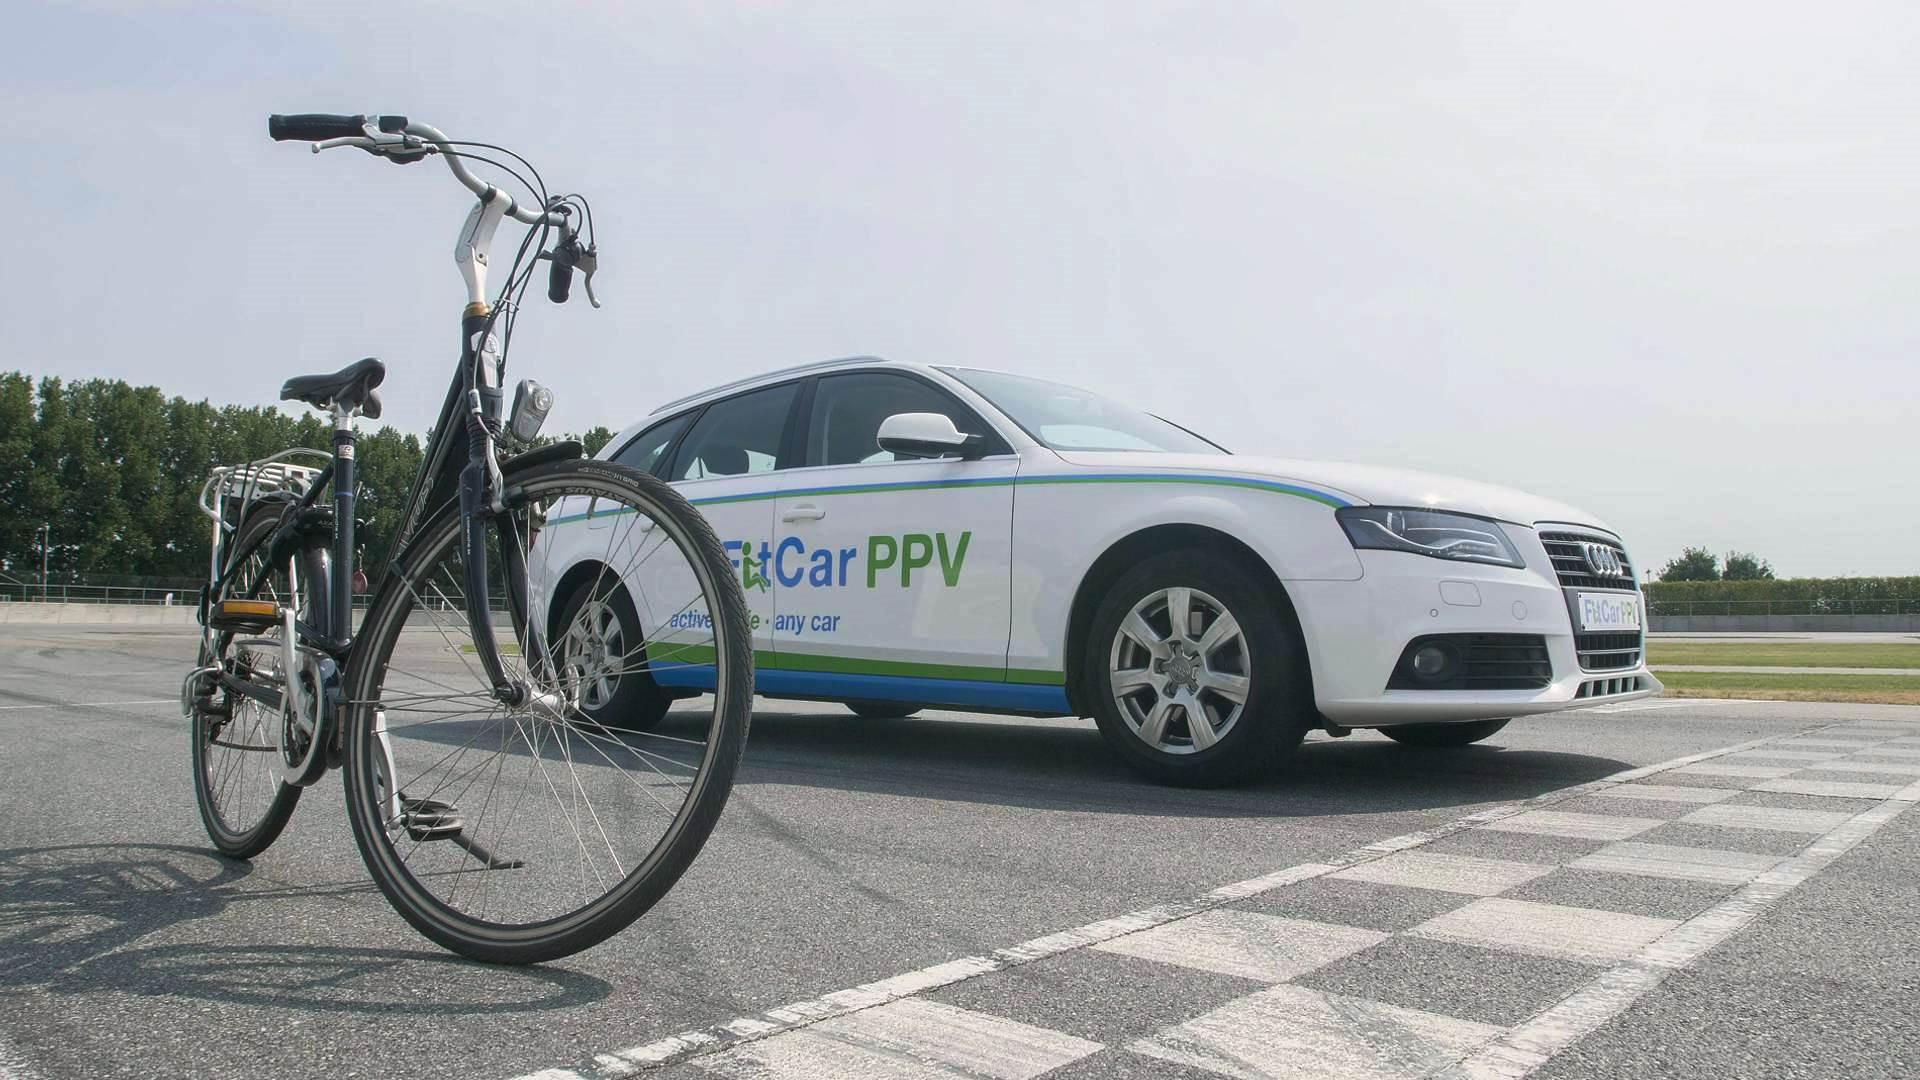 Audi A4 FitCar PPV (1)